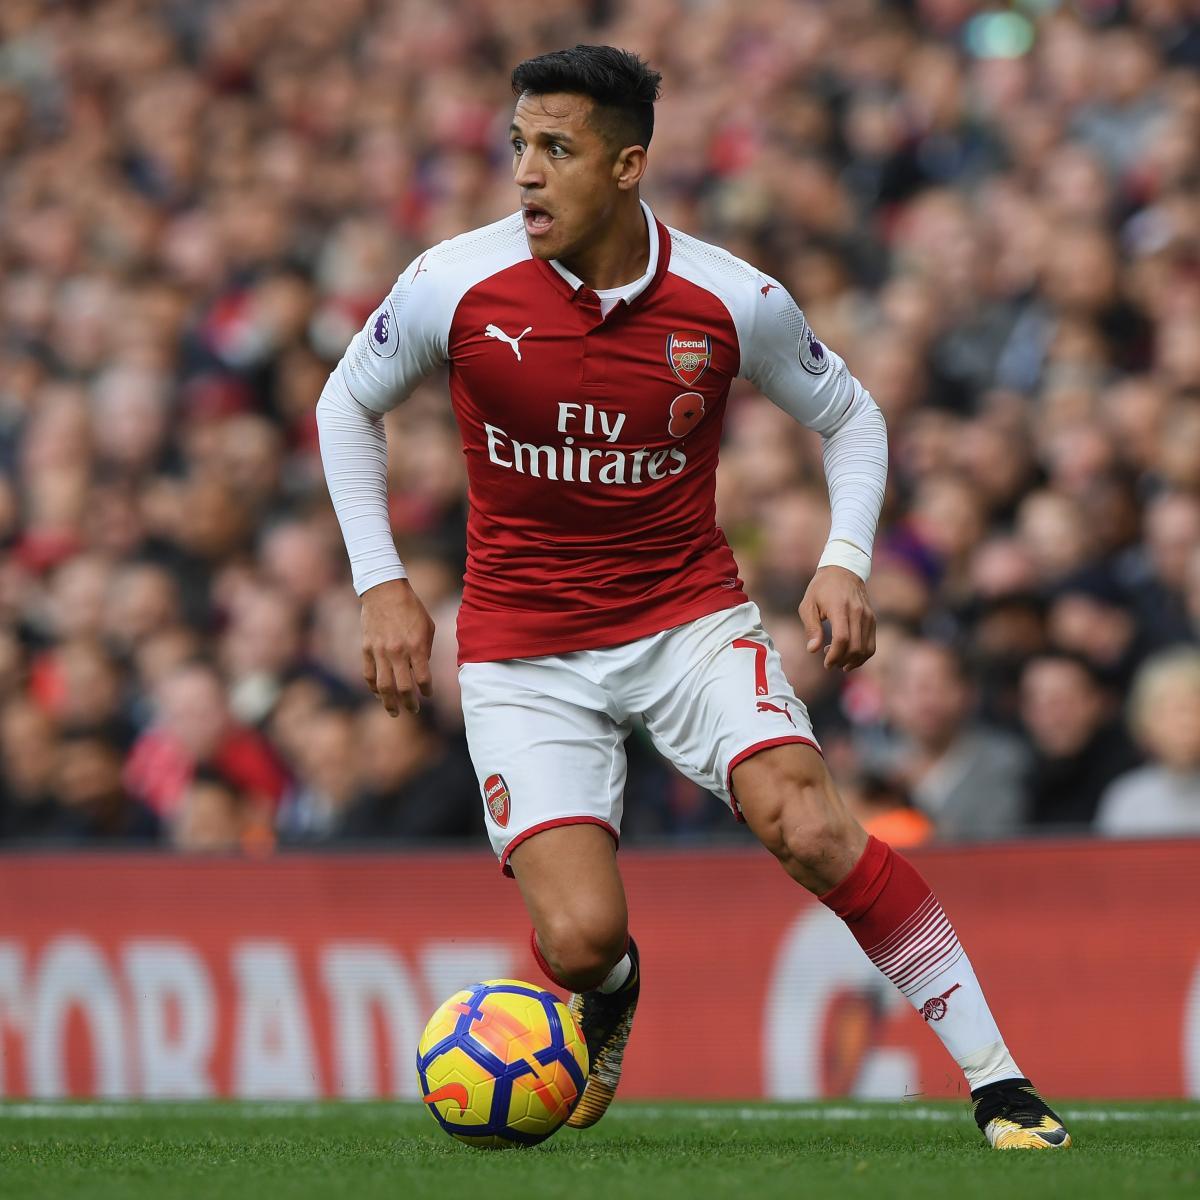 Manchester United Transfer News Alexis Sanchez Rumours: Manchester City Transfer News: Pep Guardiola On Alexis